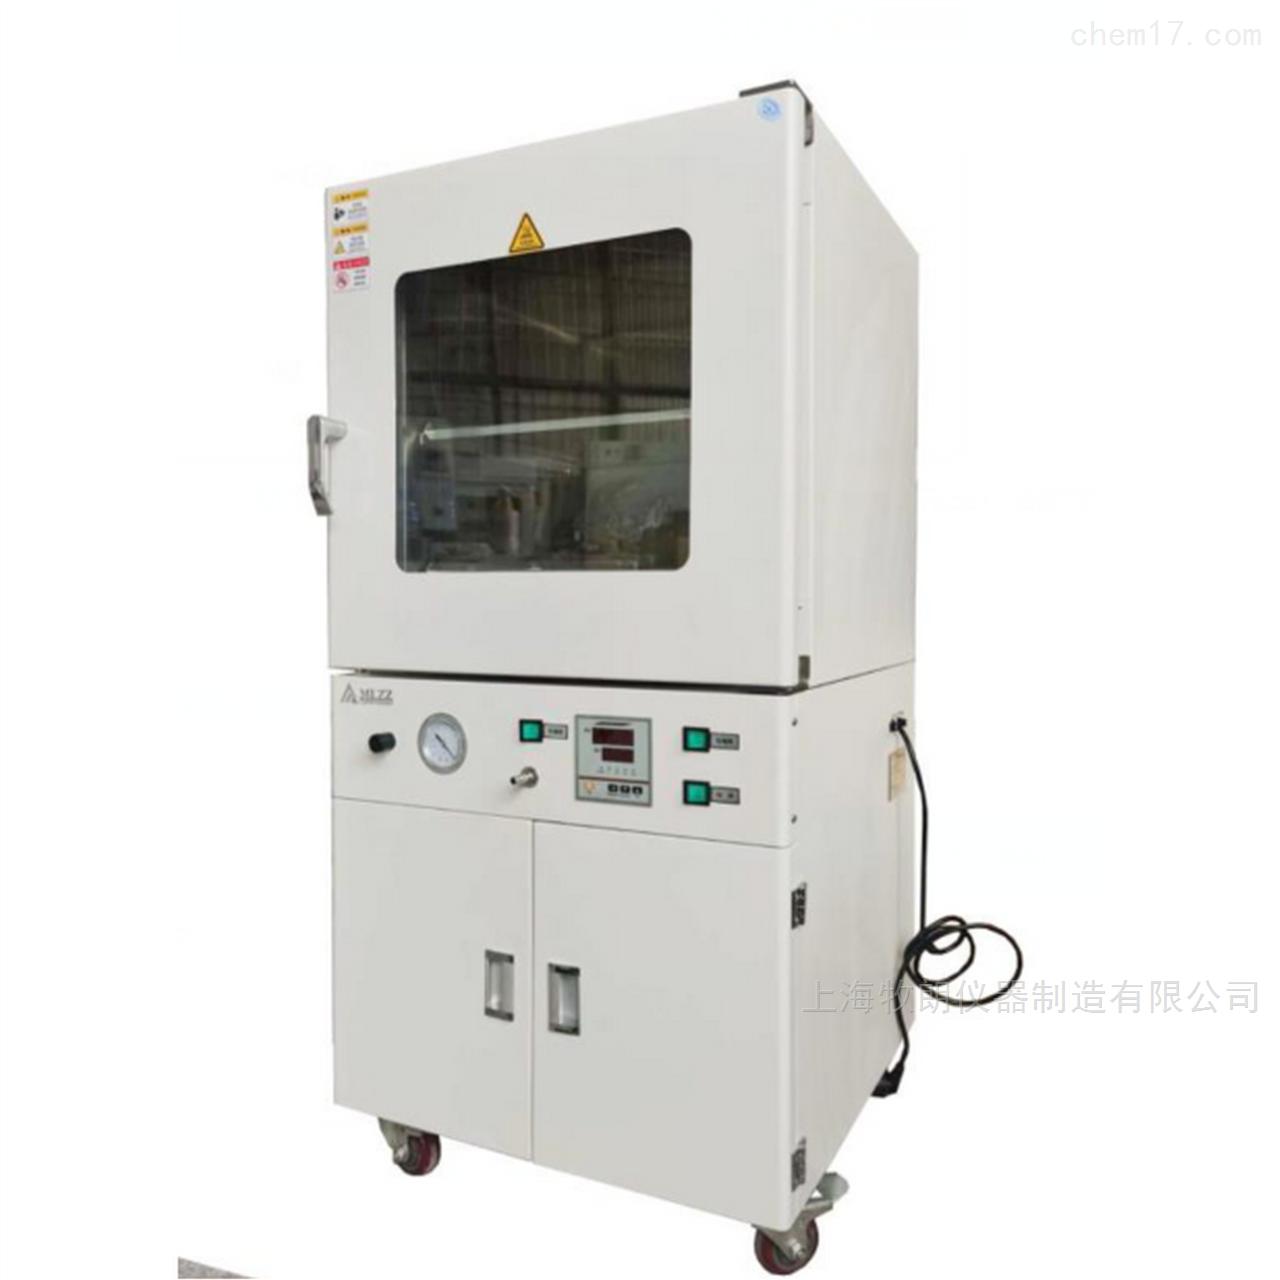 MZK-6090真空干燥箱招標參數